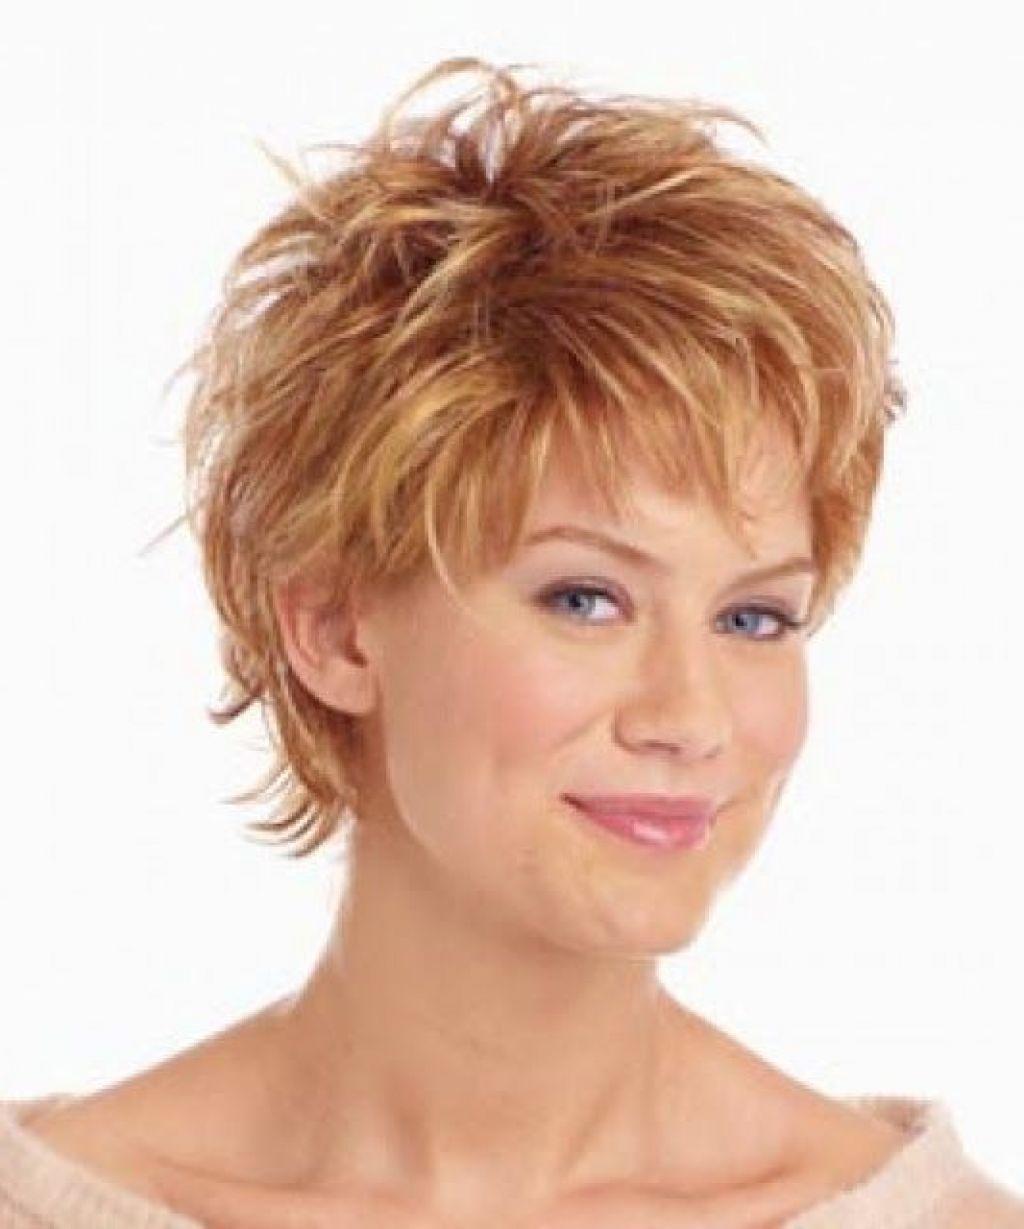 Astounding 1000 Images About Hair On Pinterest For Women Fine Hairstyles Short Hairstyles For Black Women Fulllsitofus